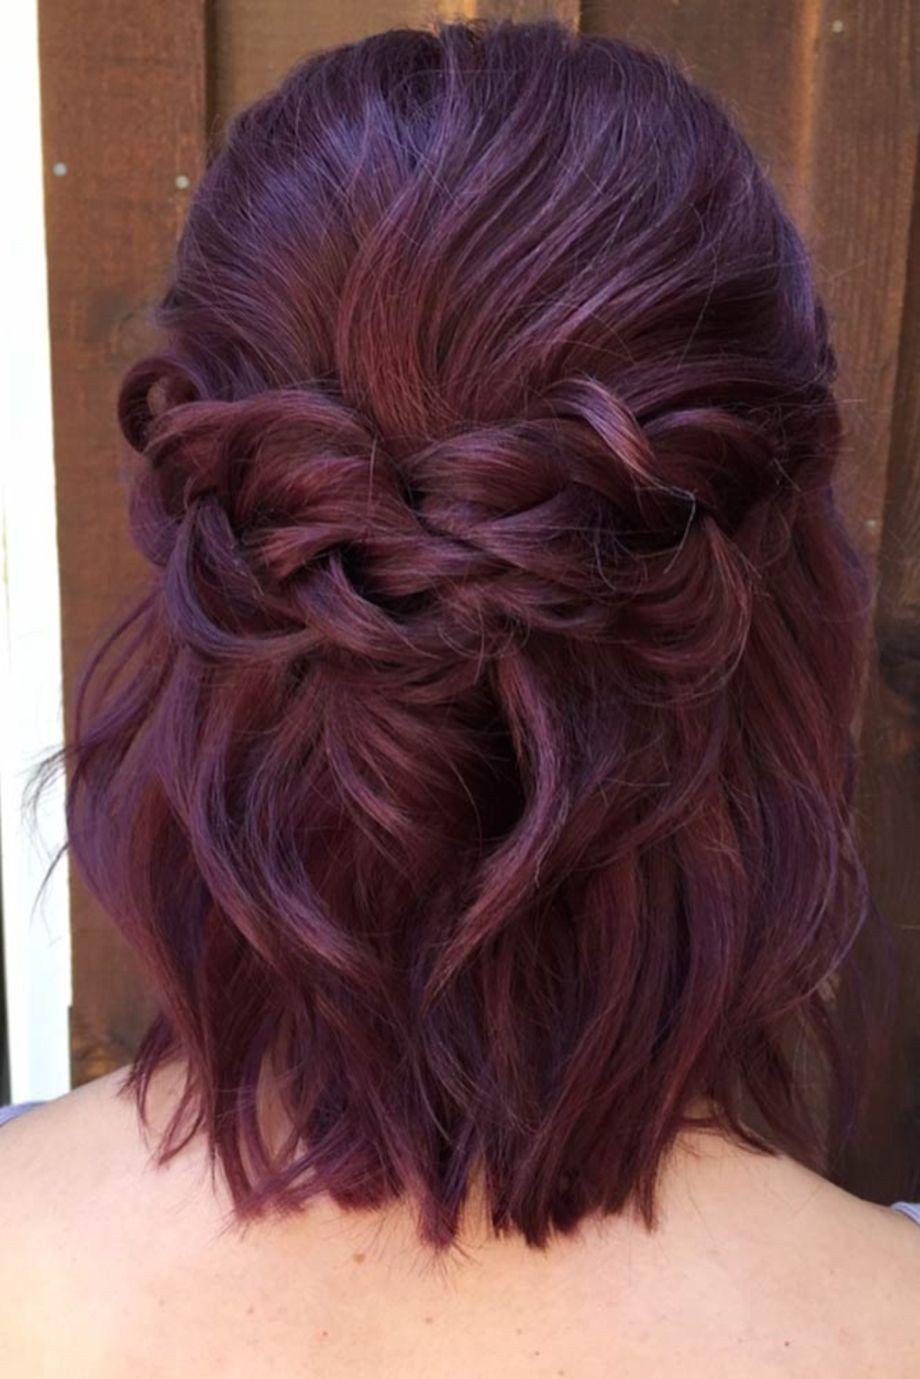 Stunning Wedding Hairstyles Ideas For Shoulder Length Hair 28 Weddinghairstyles Braided Hairstyles For Wedding Short Wedding Hair Wedding Hair Half